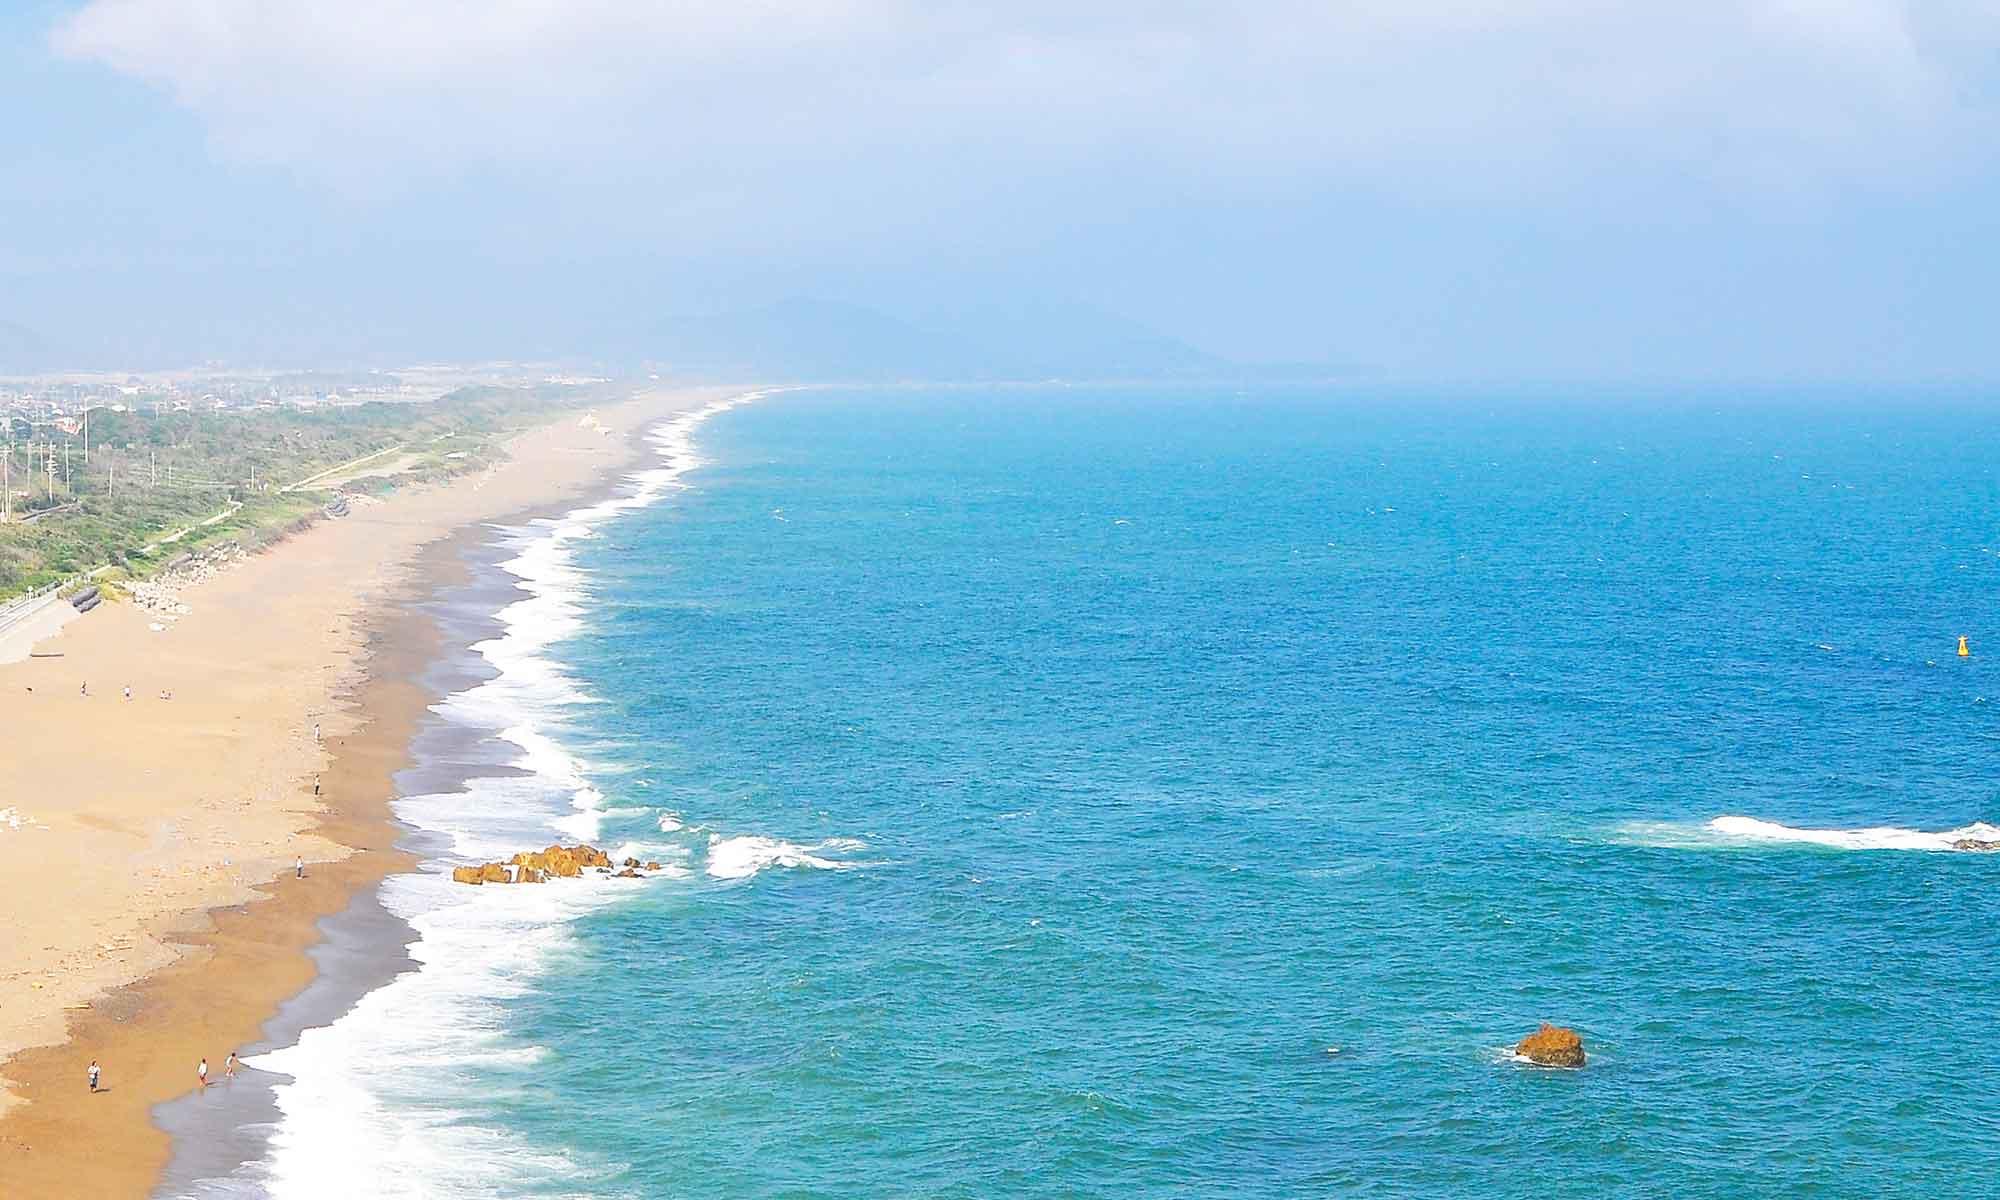 遠州灘伊良湖の海